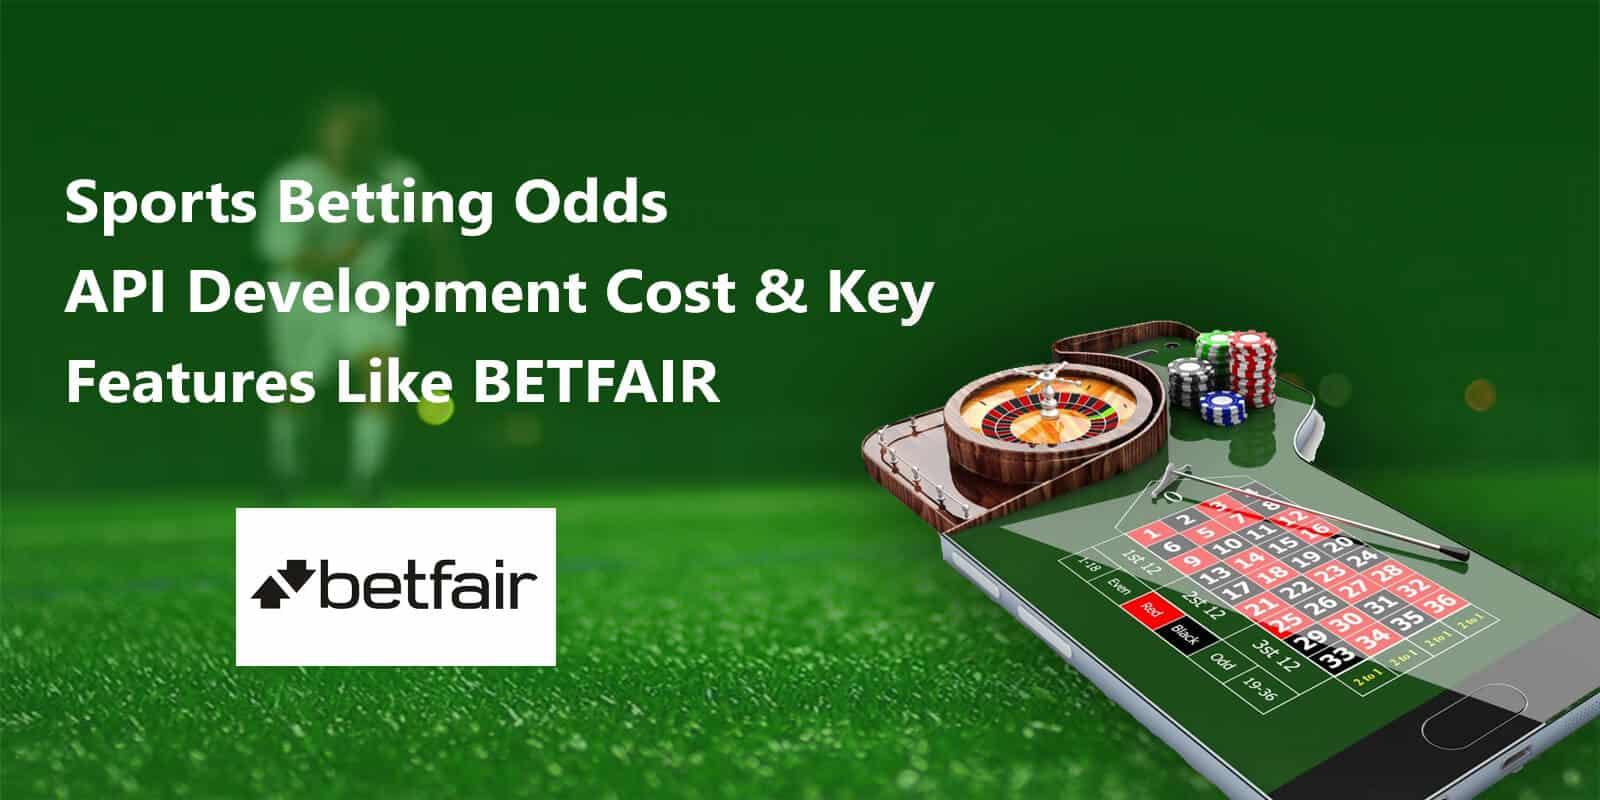 Online Sports Betting Odds API Development Cost & Key Features Like BETFAIR